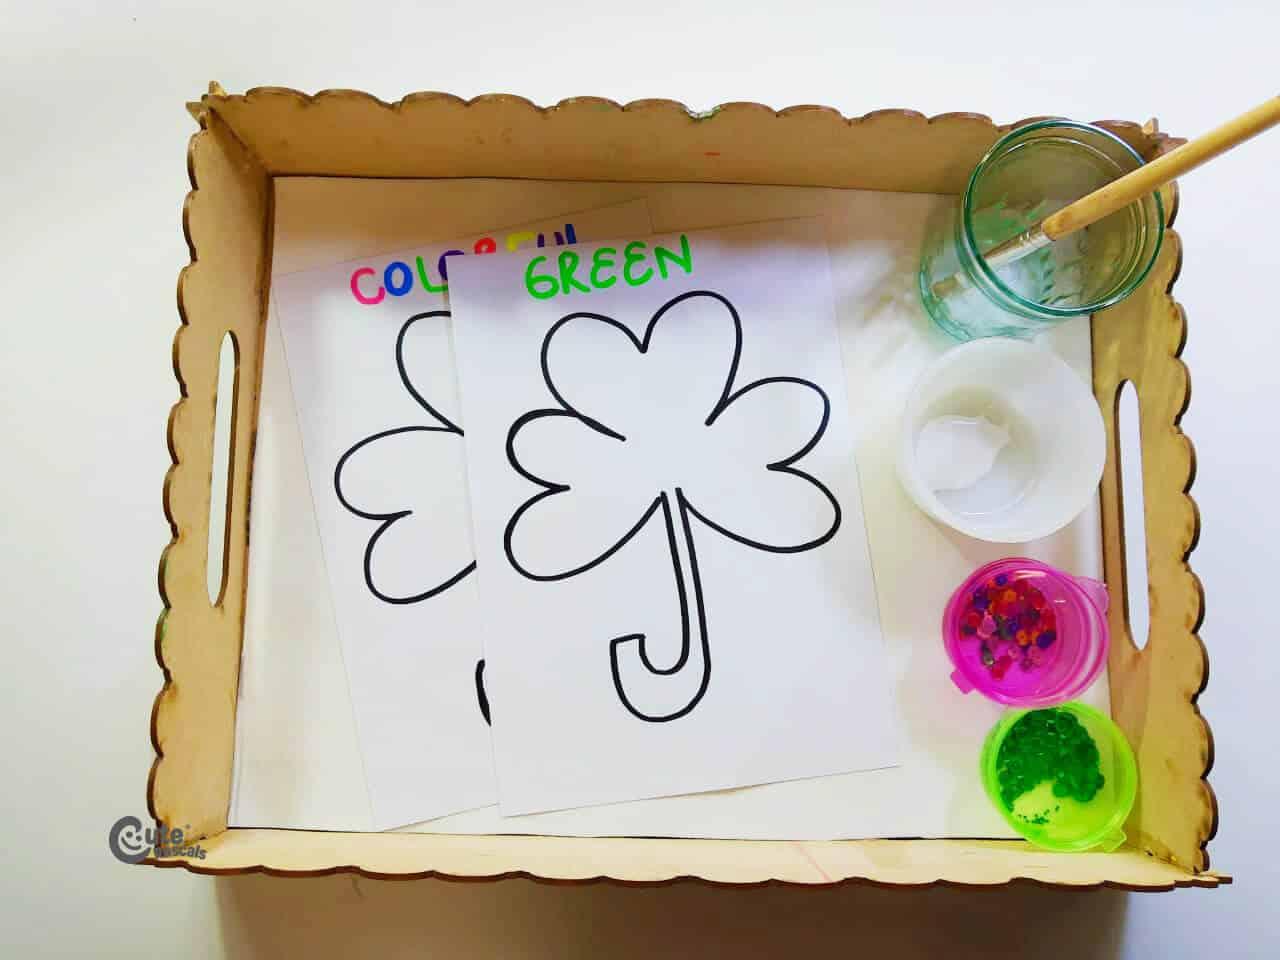 Materials Sequined Clover Activity. For fine motor skills for preschoolers